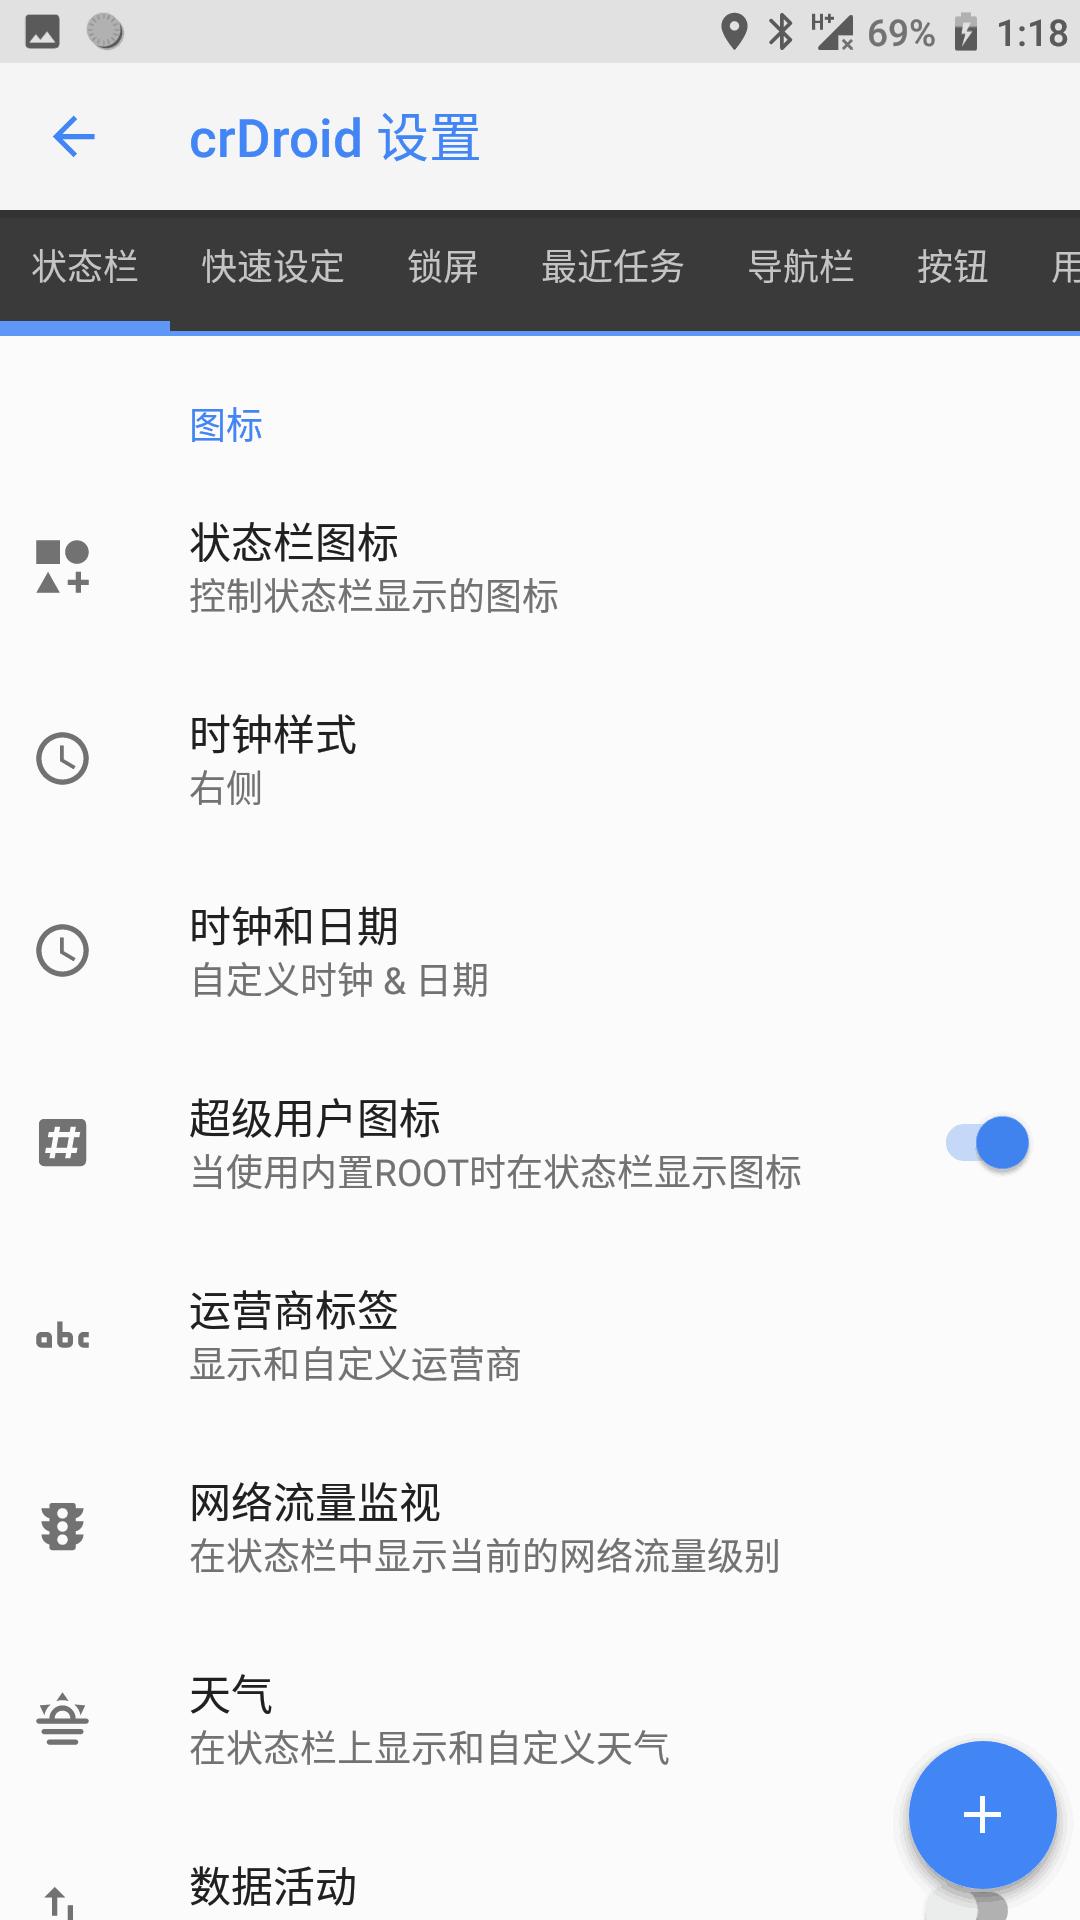 QQ图片20180514230948.png